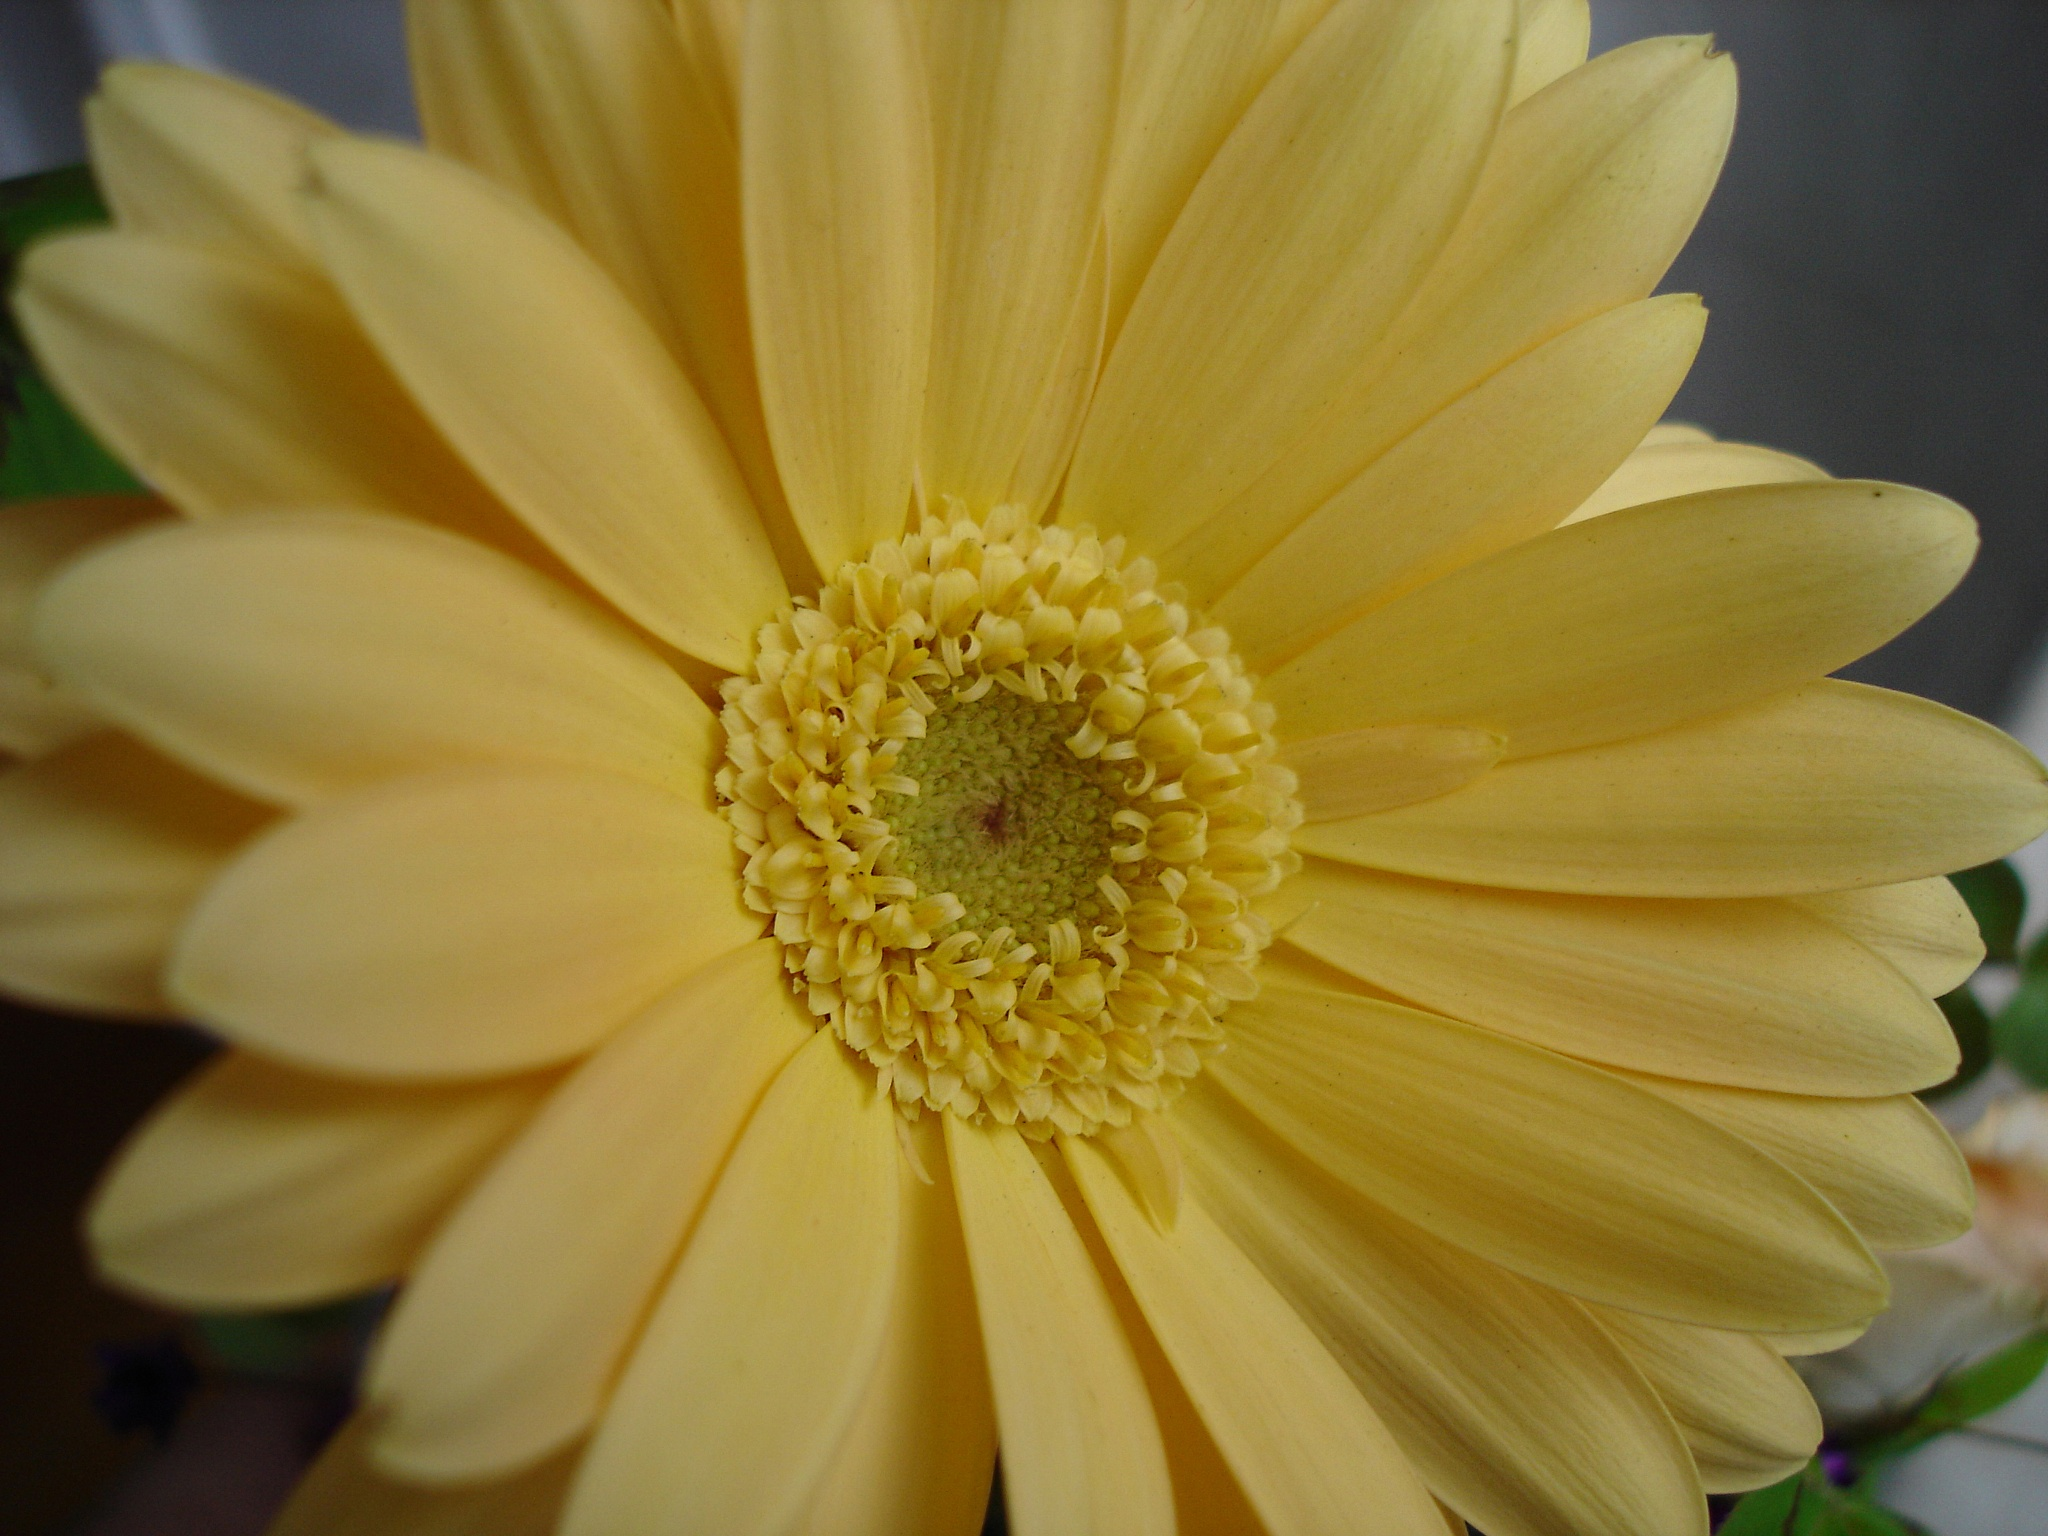 Sweet yellow by sidney ganho